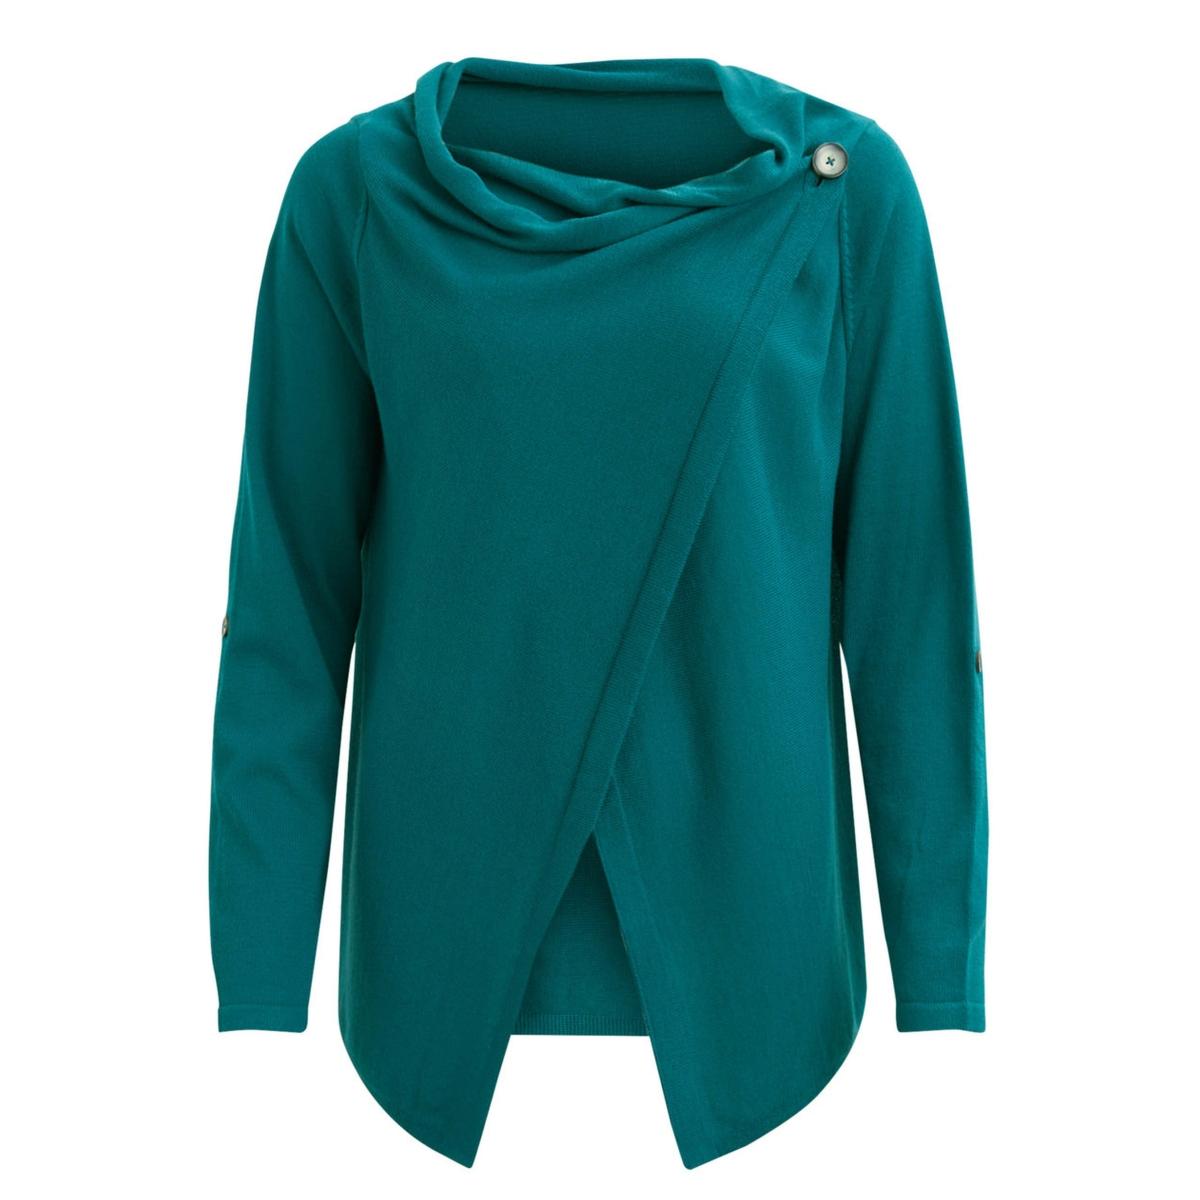 objdeanna light knit cardigan noos 23025313 object vest deep teal